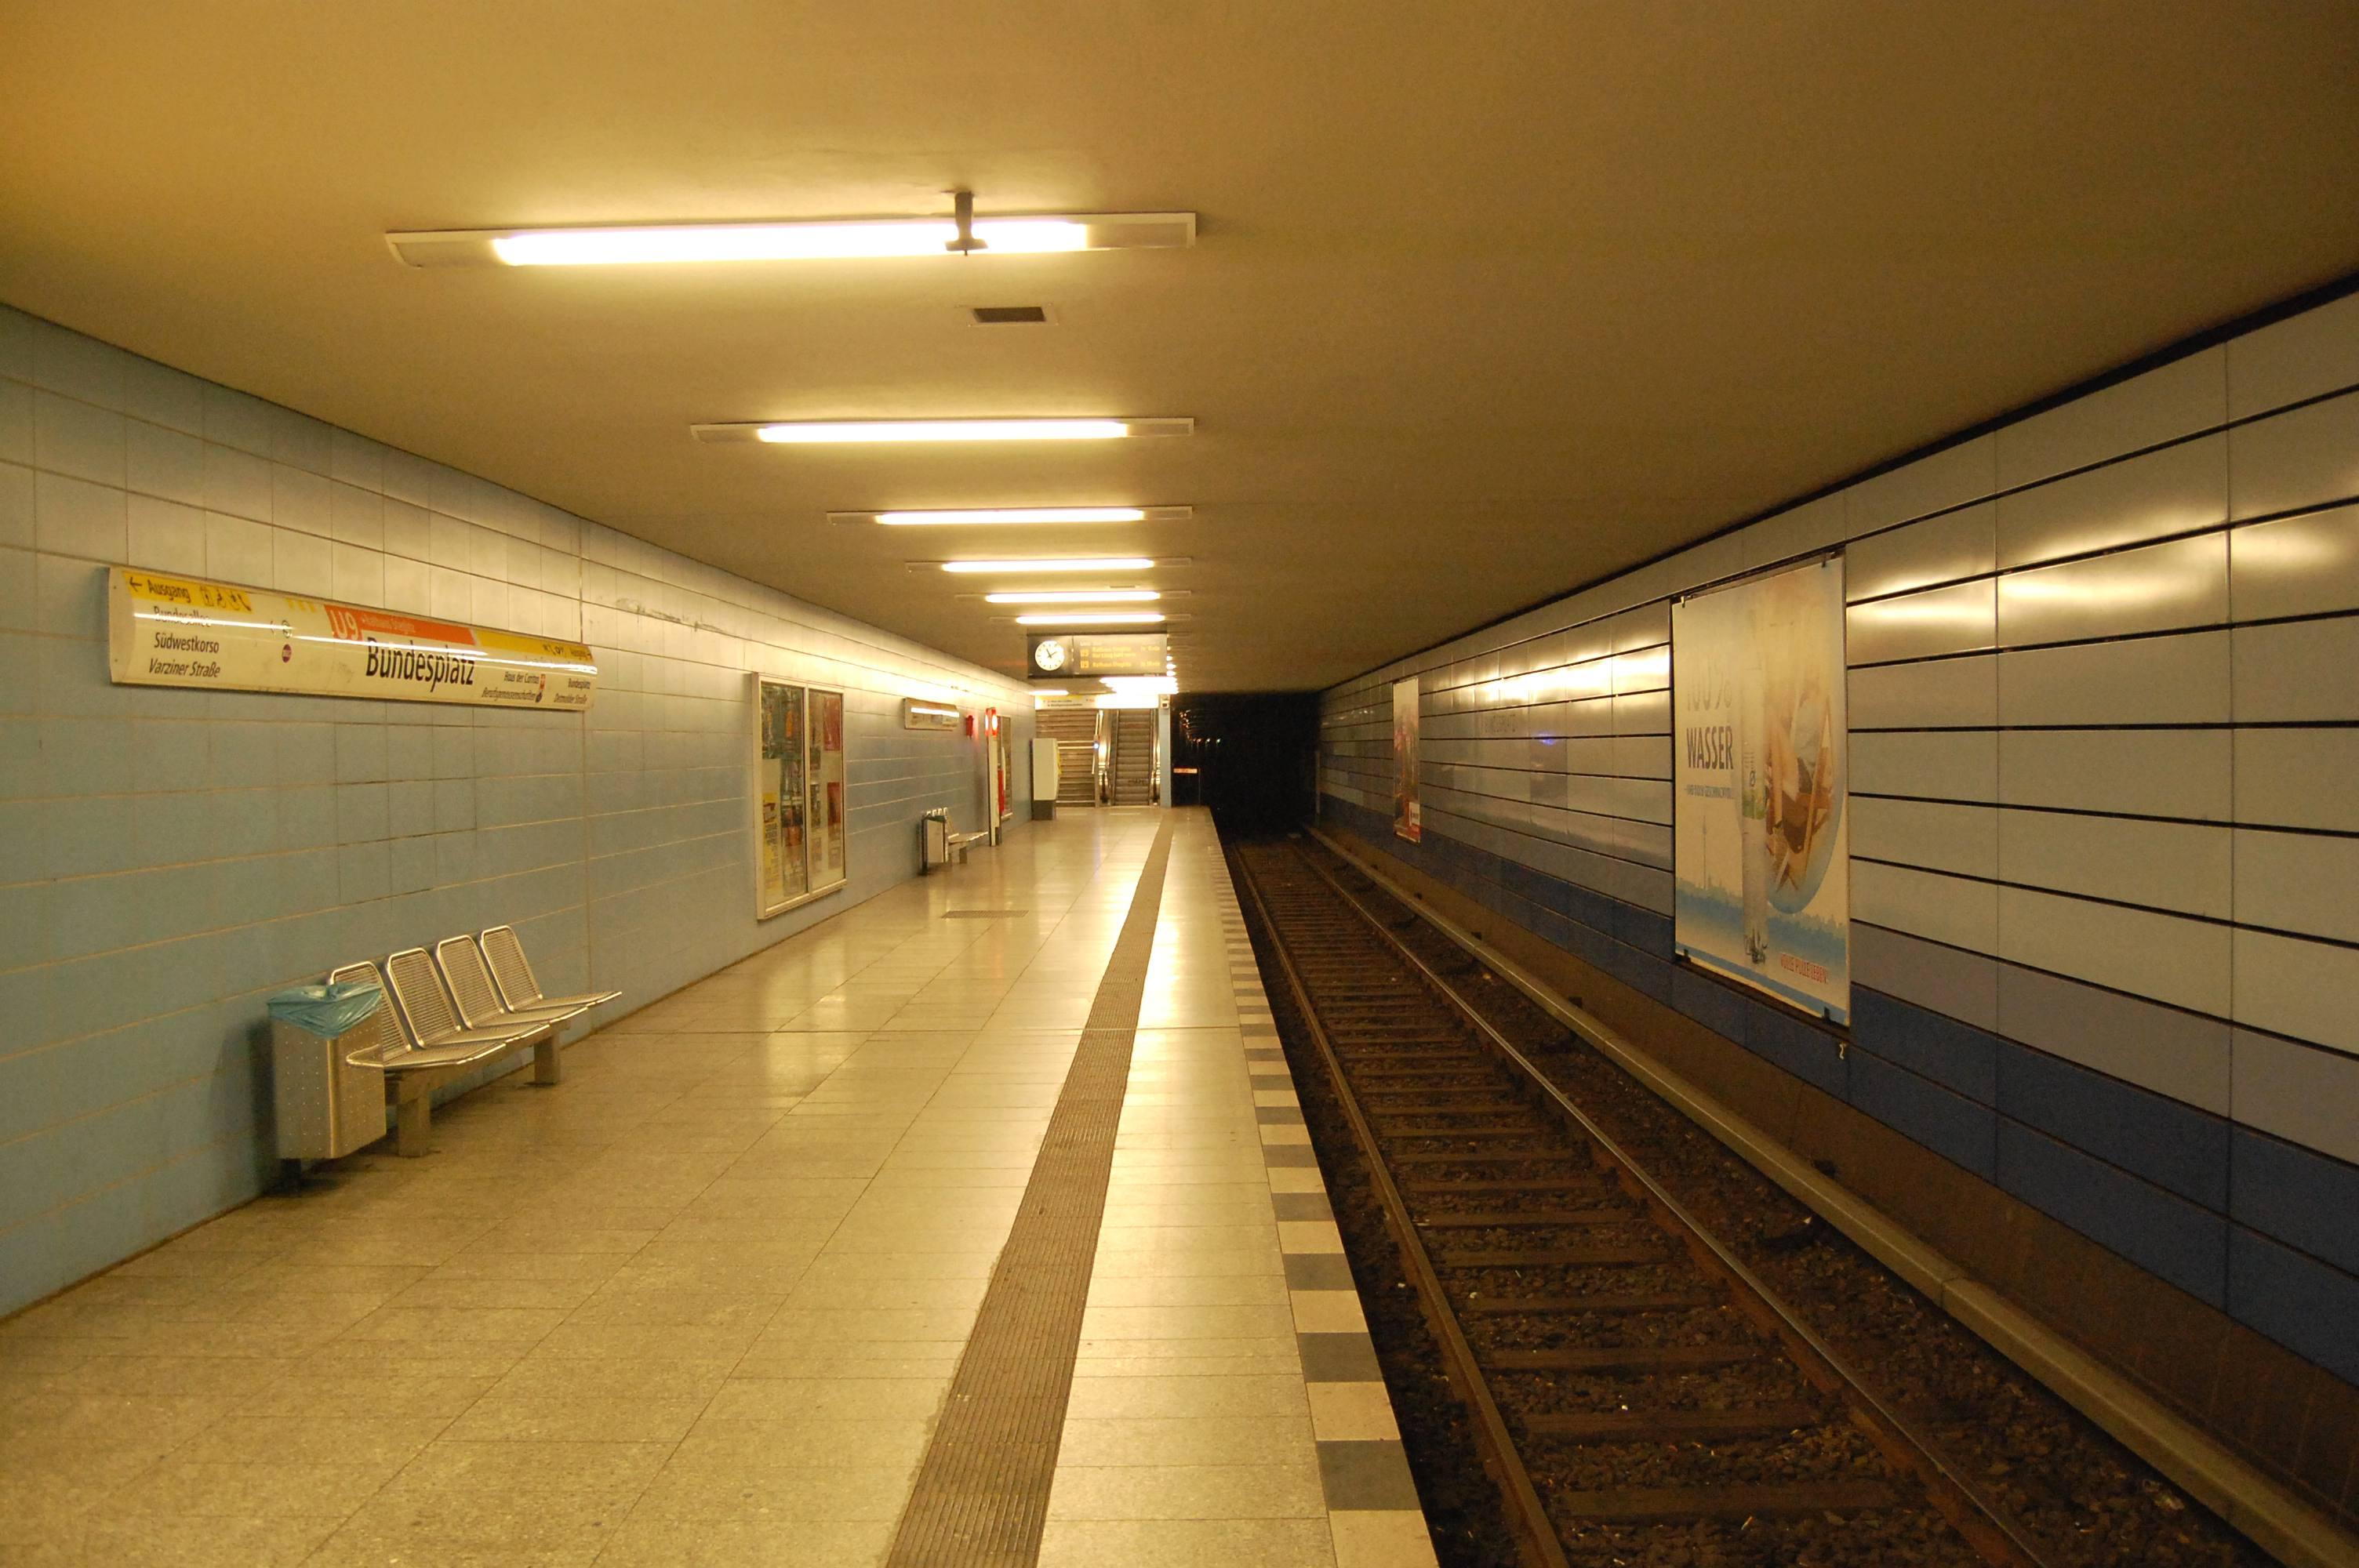 u-bf-bundesplatz-4_web